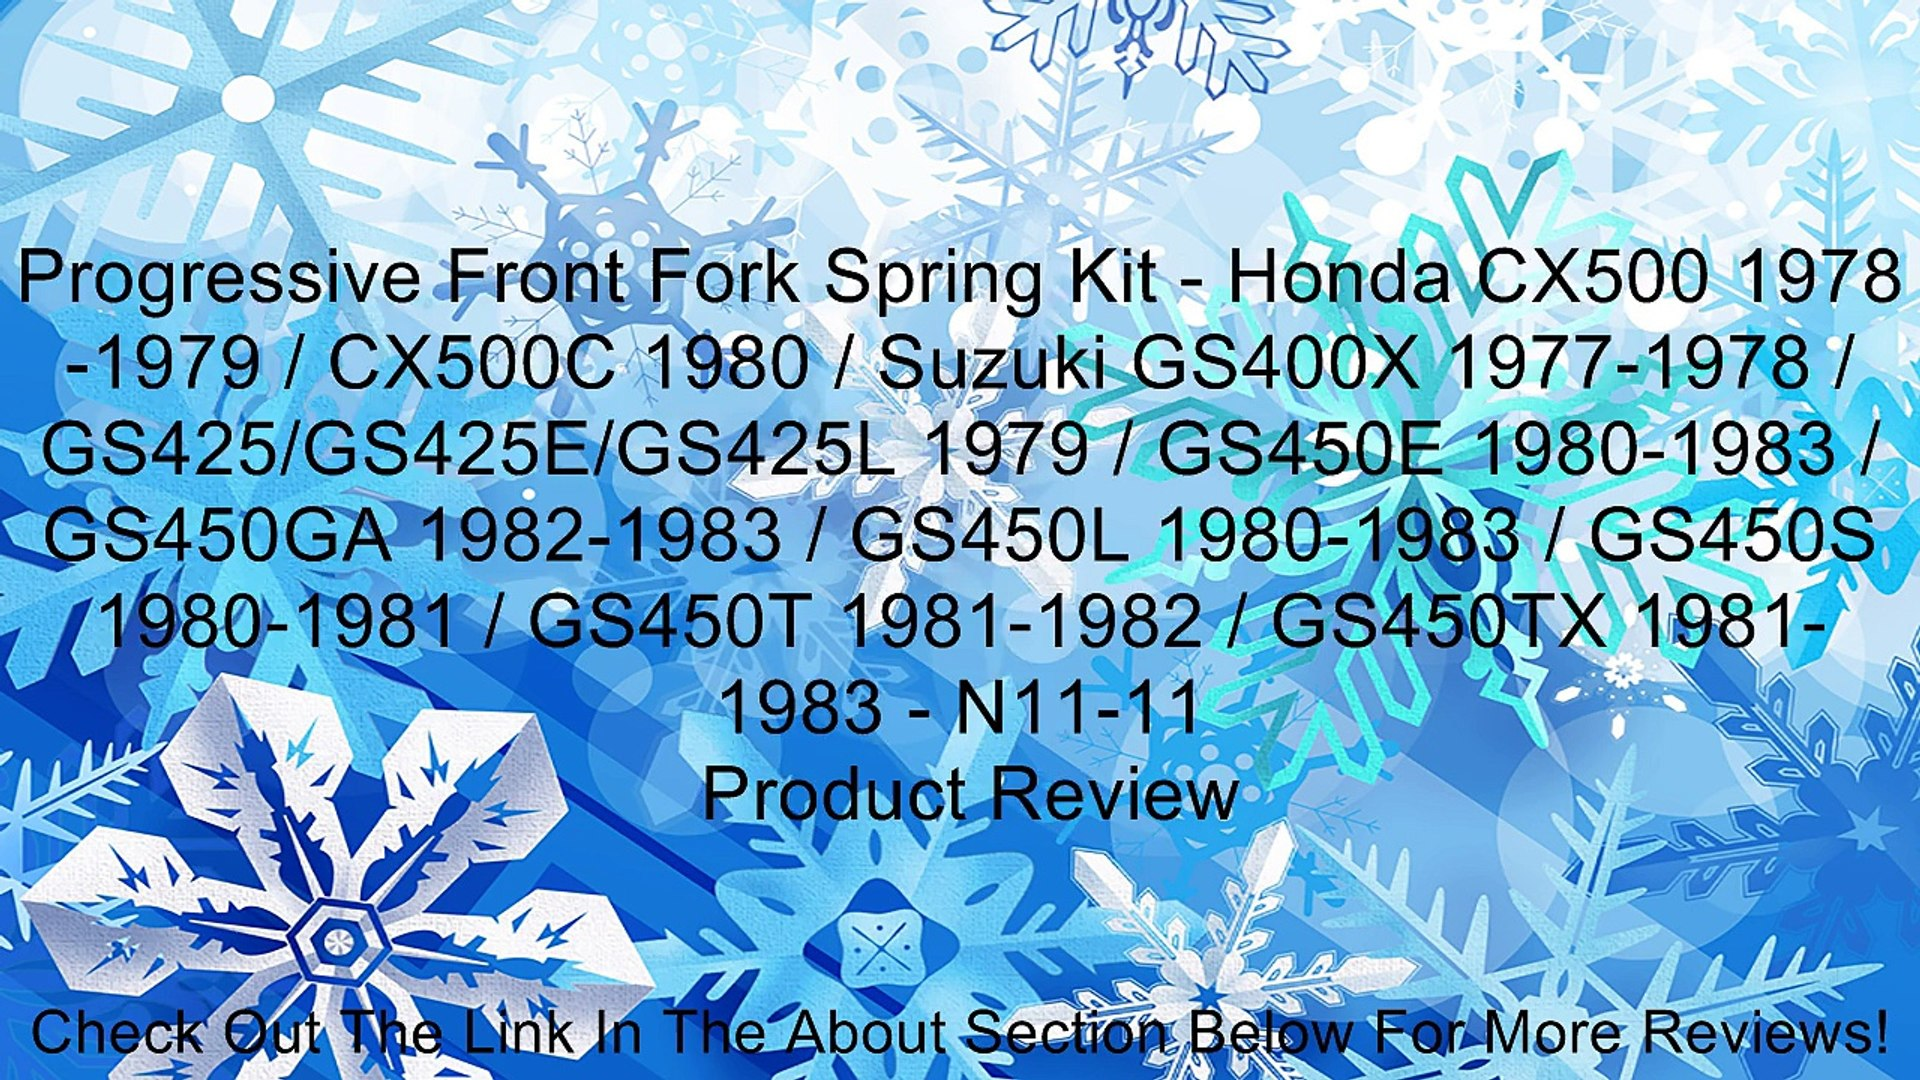 Progressive Front Fork Spring Kit - Honda CX500 1978-1979 / CX500C 1980 / Suzuki GS400X 1977-1978 / GS425/GS425E/GS425L 1979 / GS450E 1980-1983 / GS450GA 1982-1983 / GS450L 1980-1983 / GS450S 1980-1981 / GS450T 1981-1982 / GS450TX 1981-1983 - N11-11 Revie